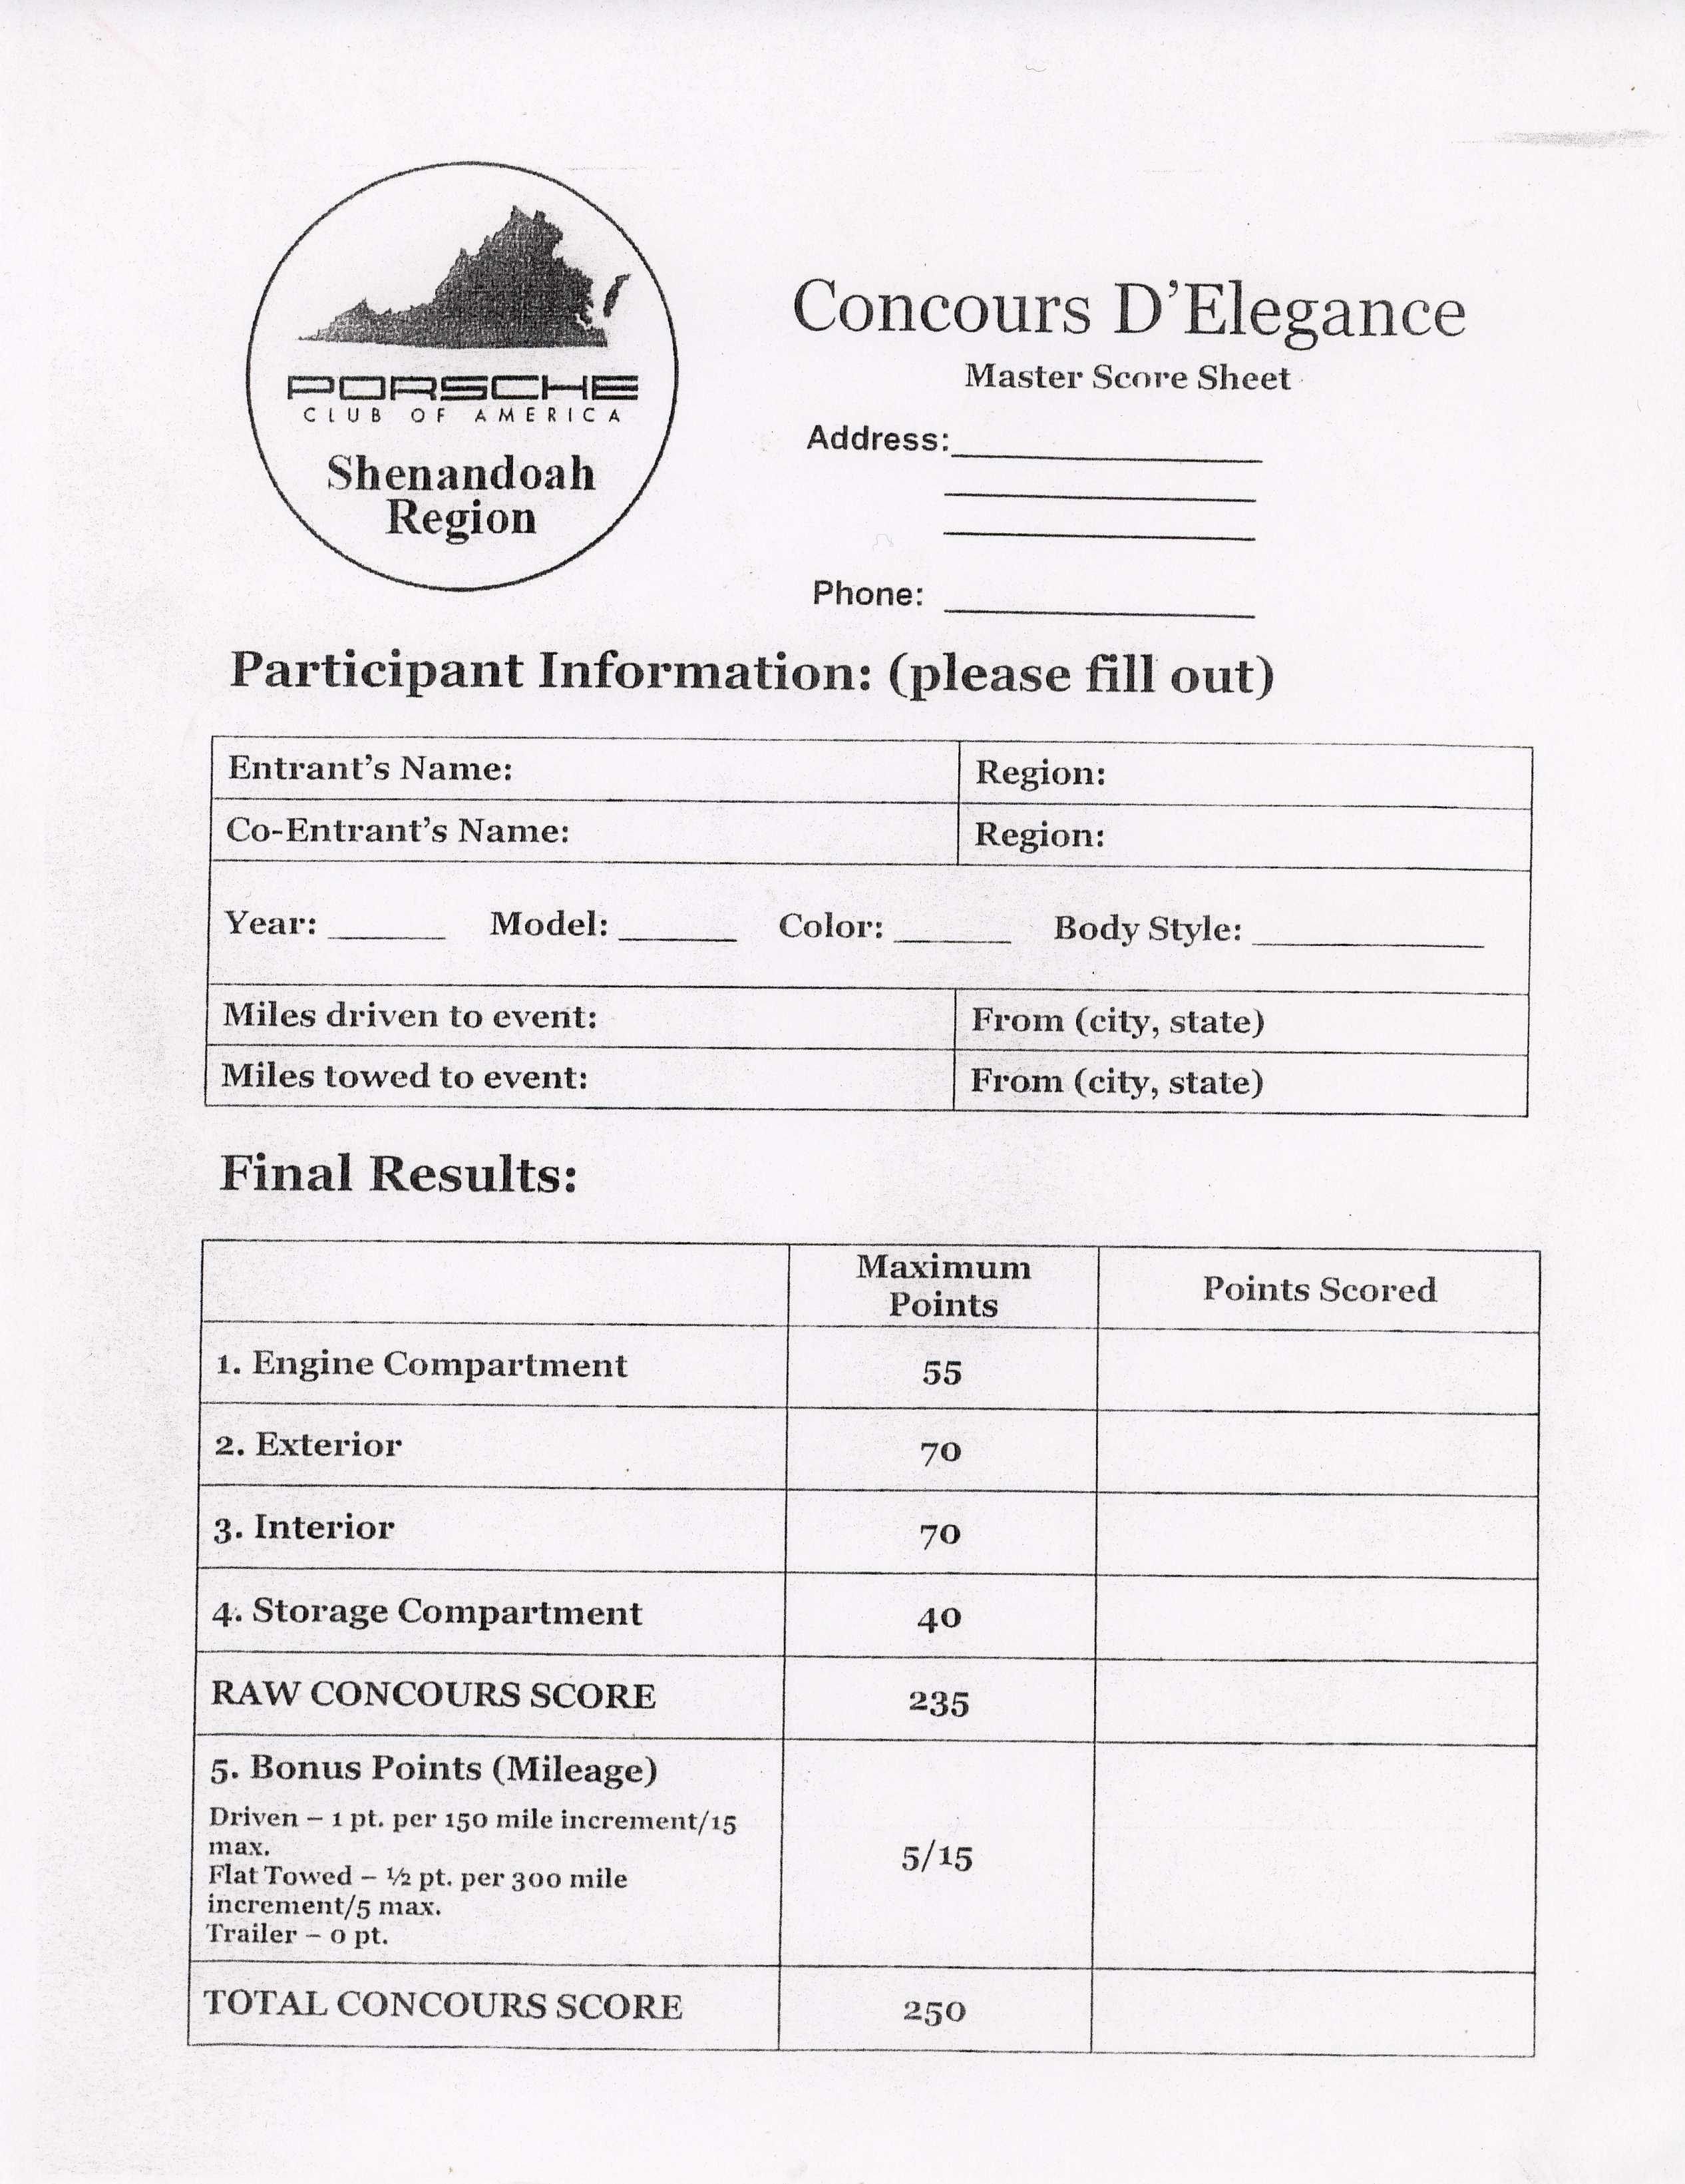 Concours - Car show judging sheet